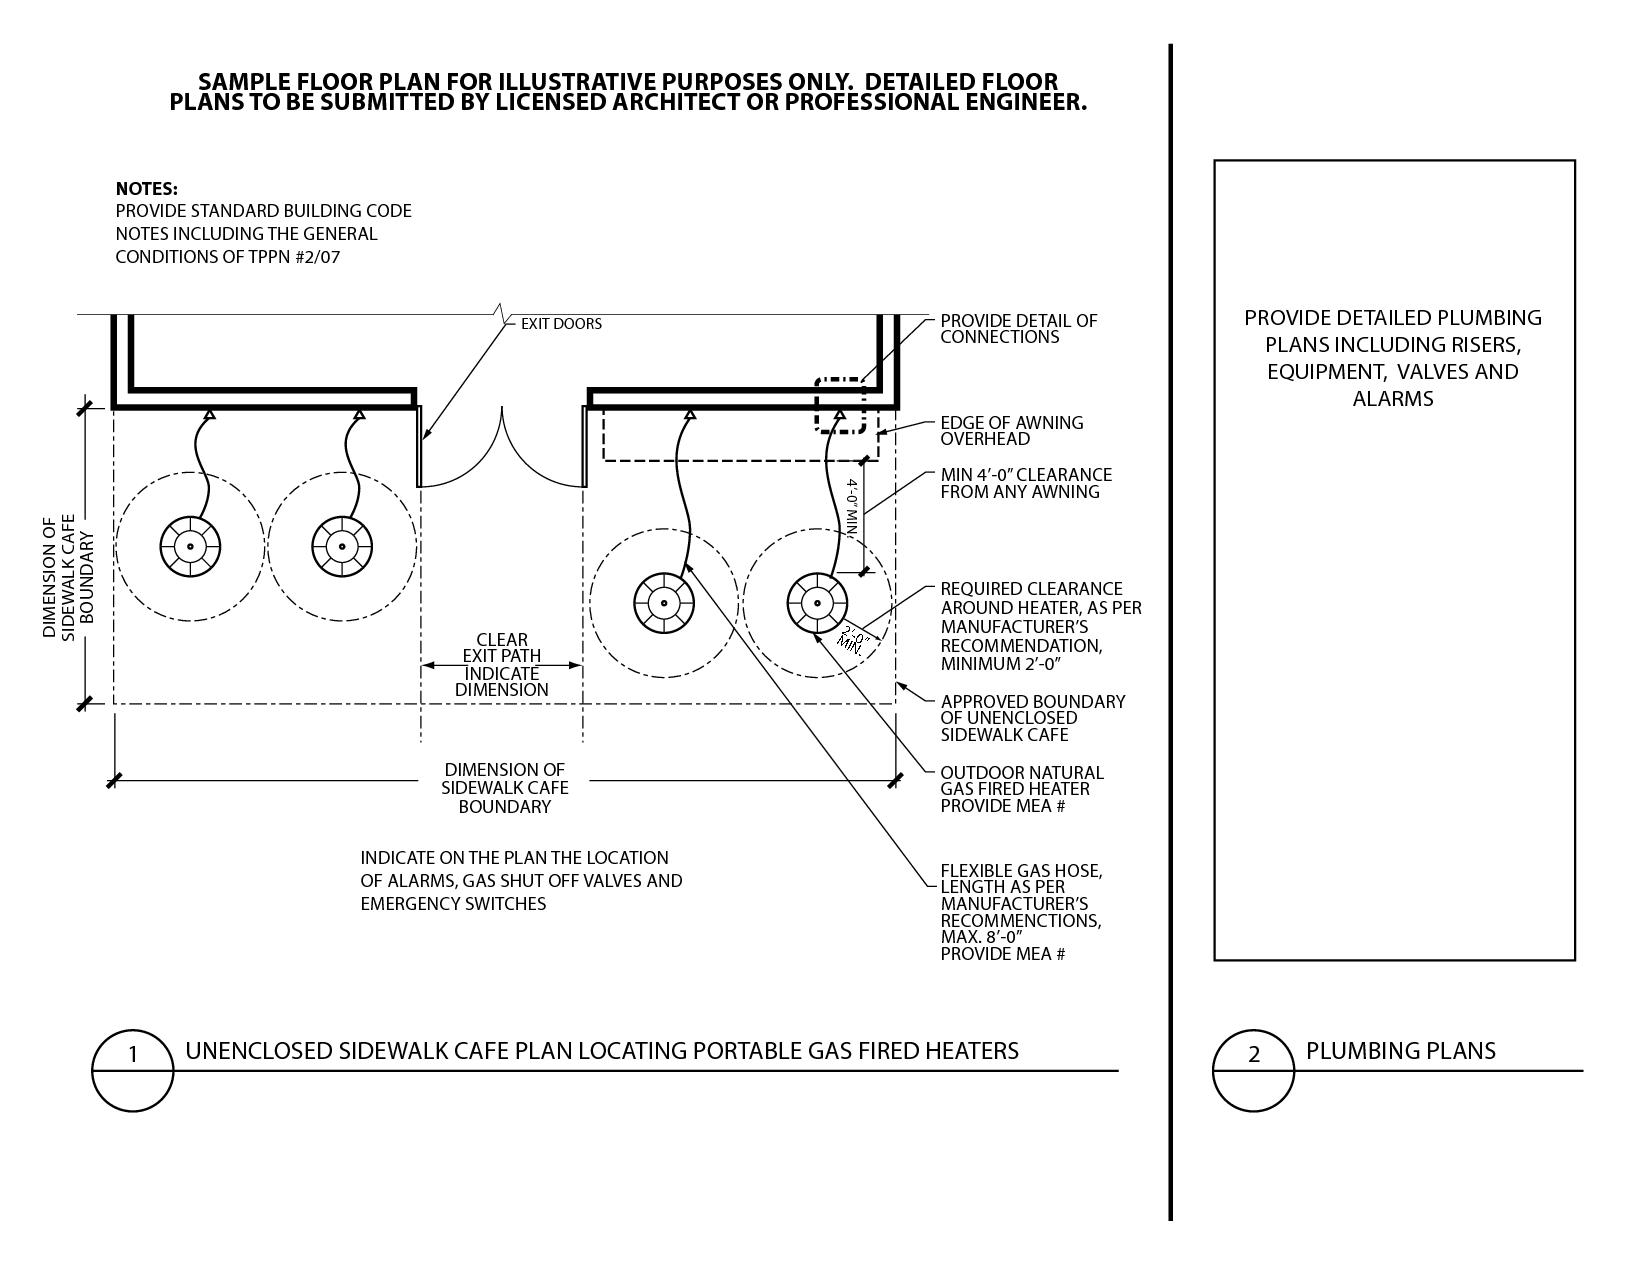 Sample Floor Plan Illustrative Purposes Only Detailed